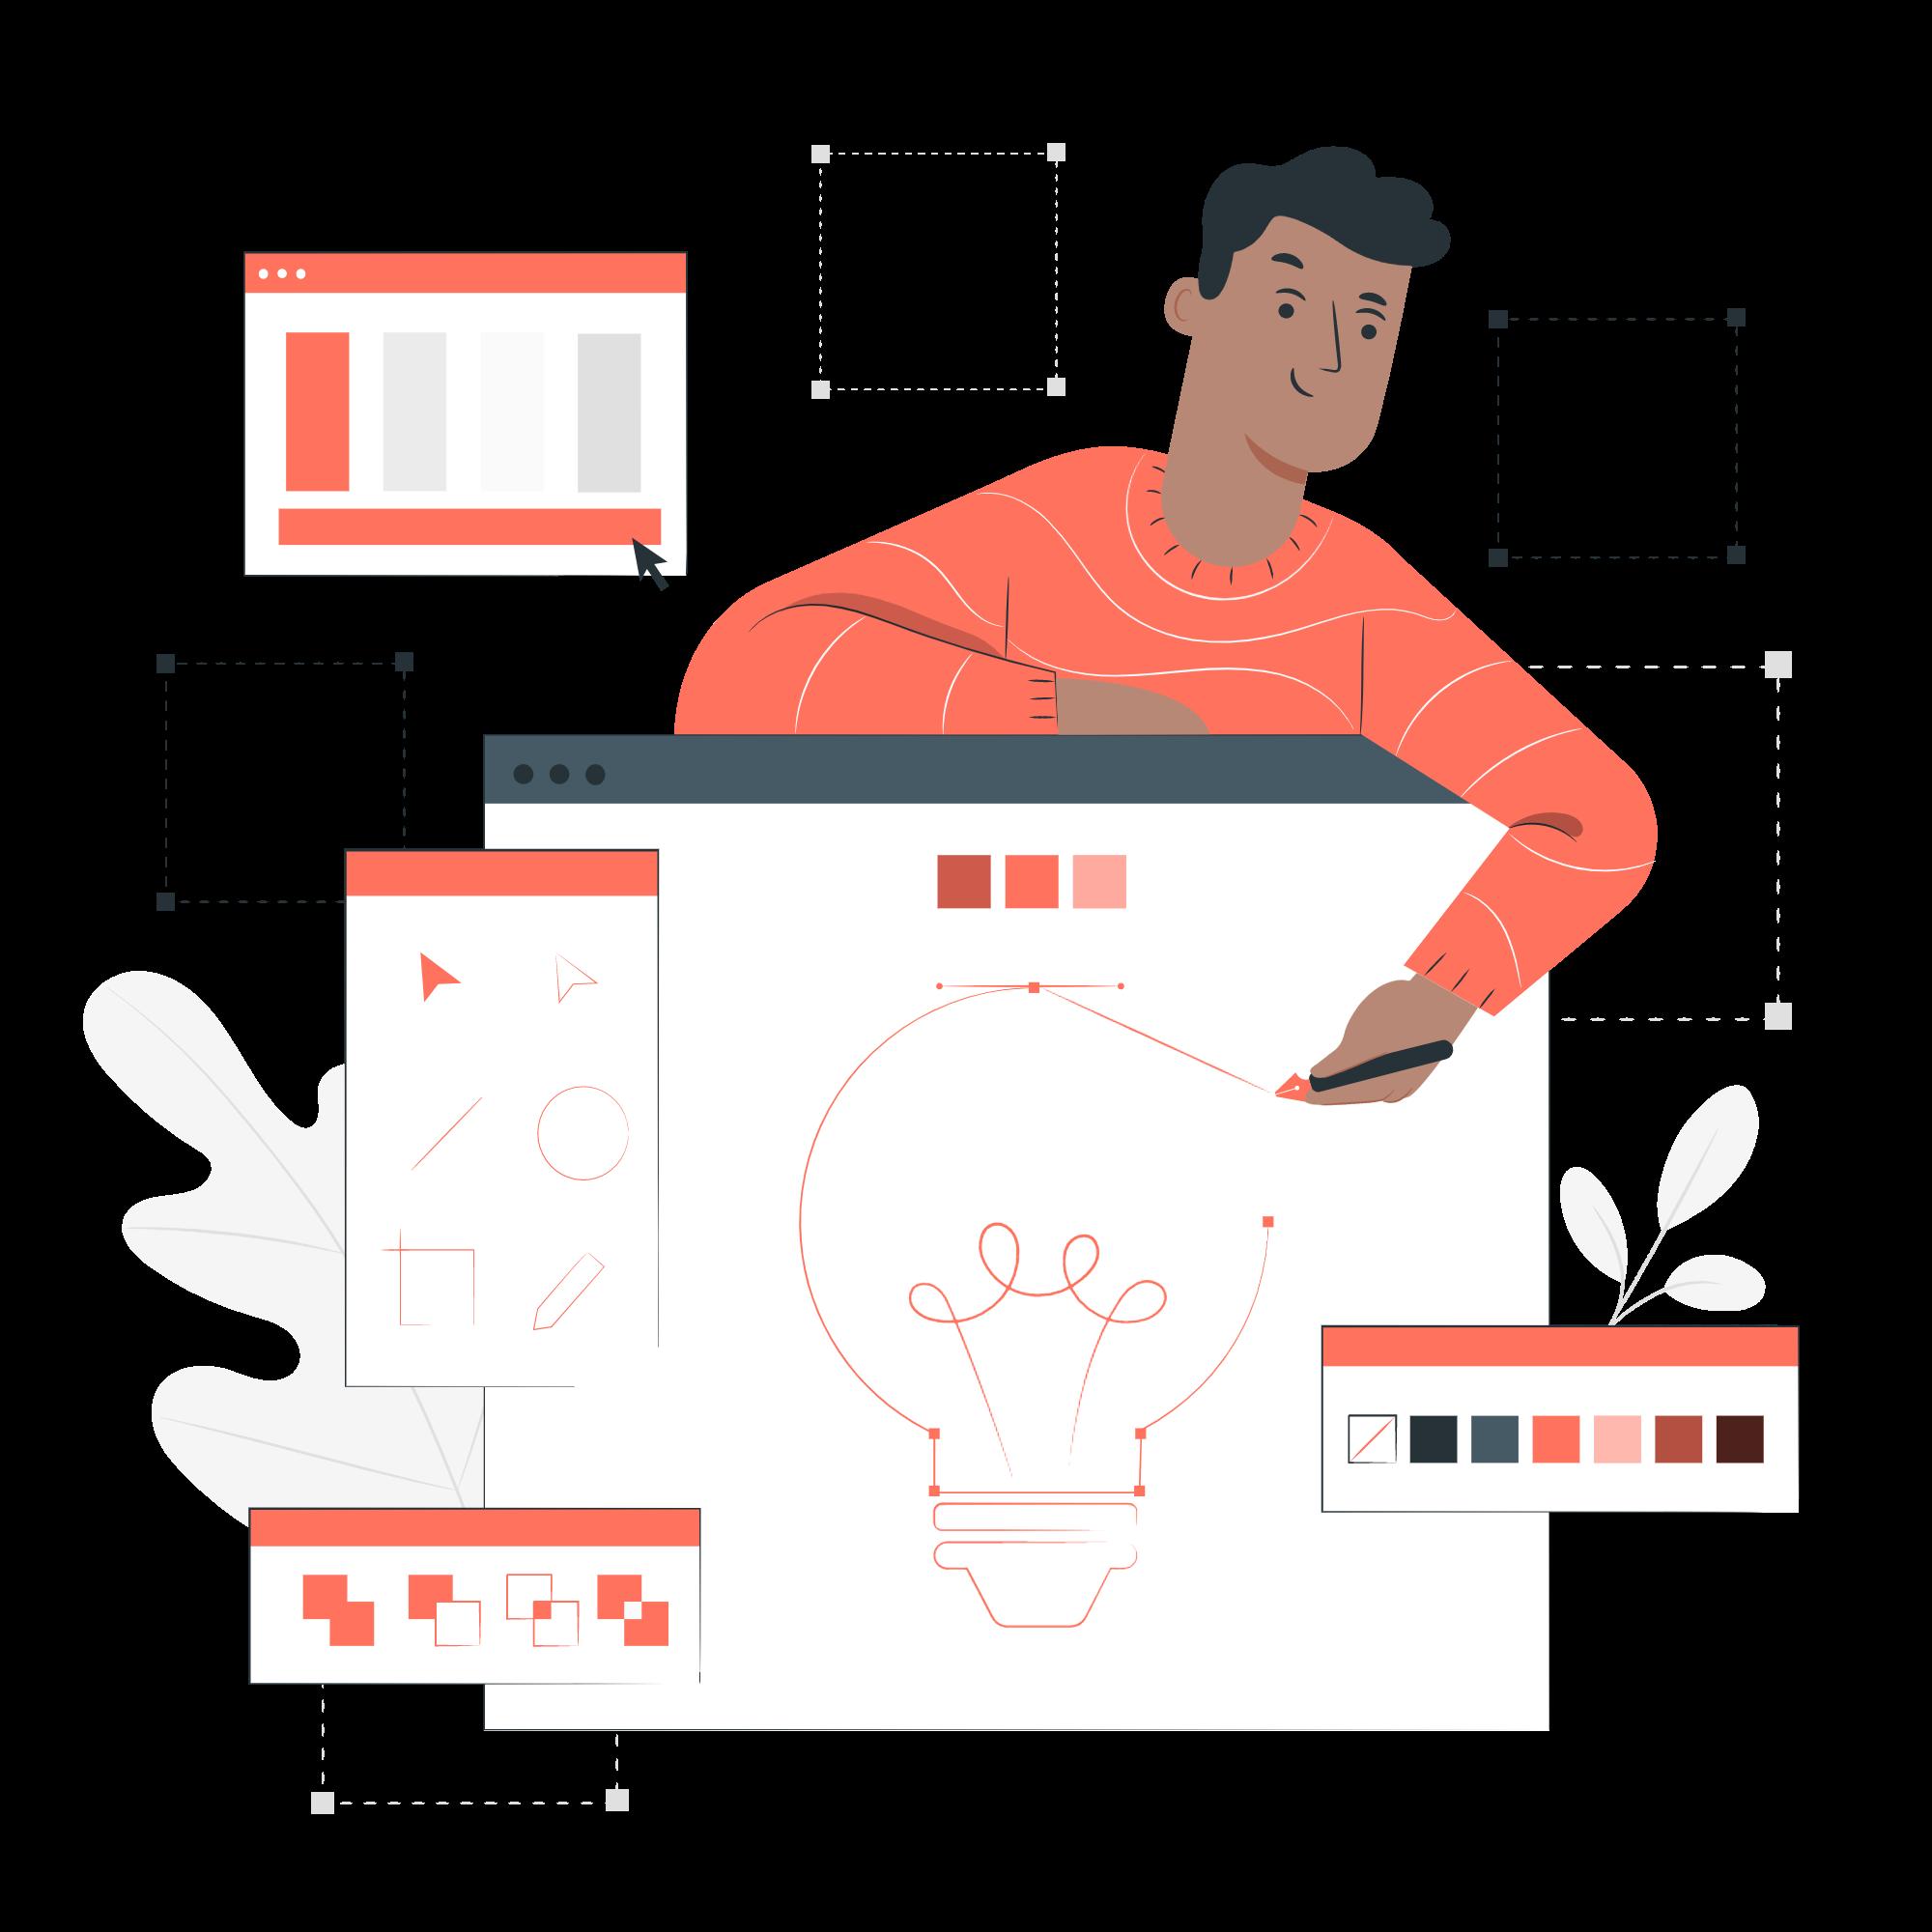 teideseo diseño web en tenerife